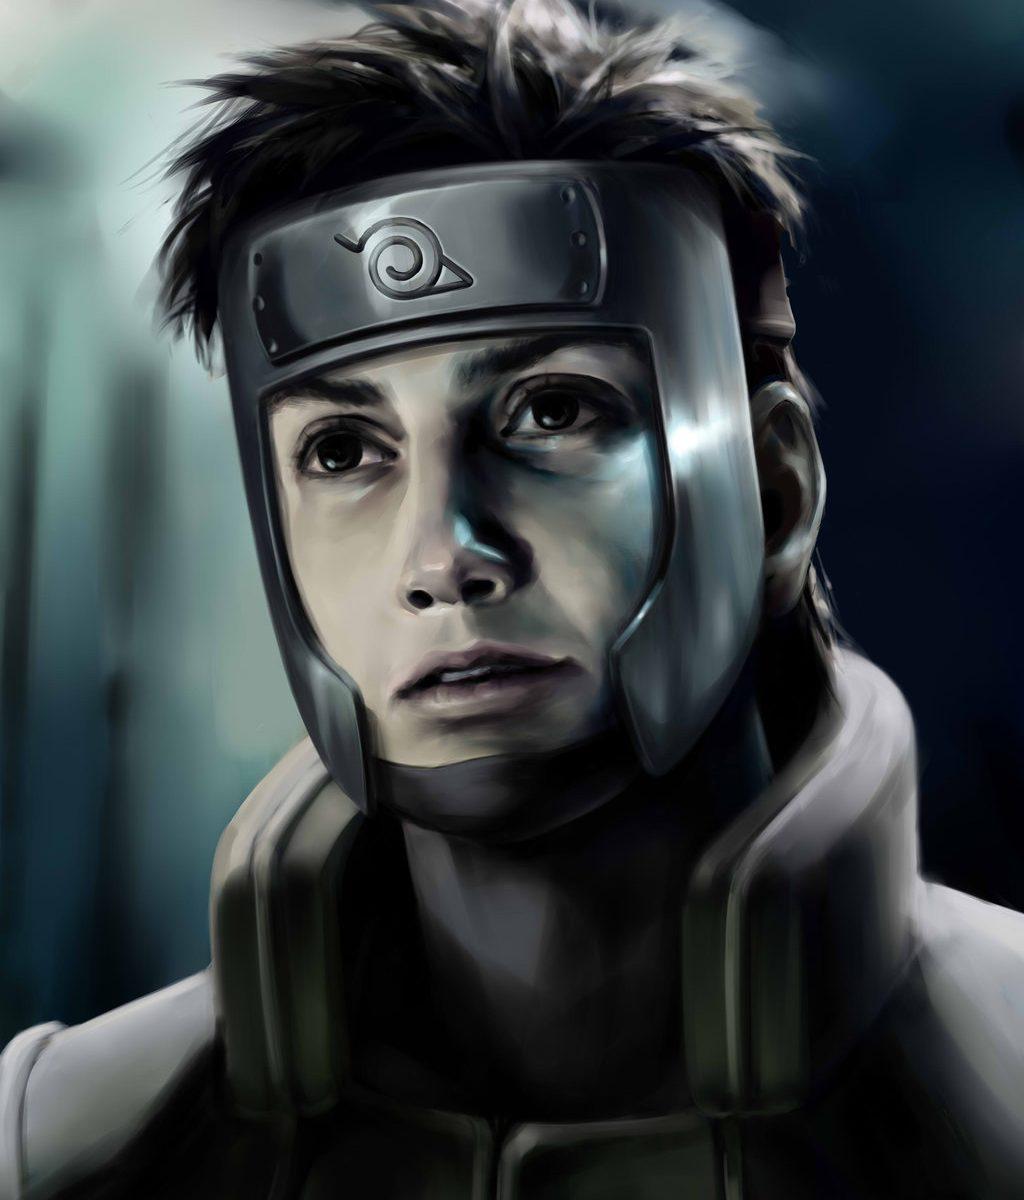 Kapten Yamato gambar oleh olggah